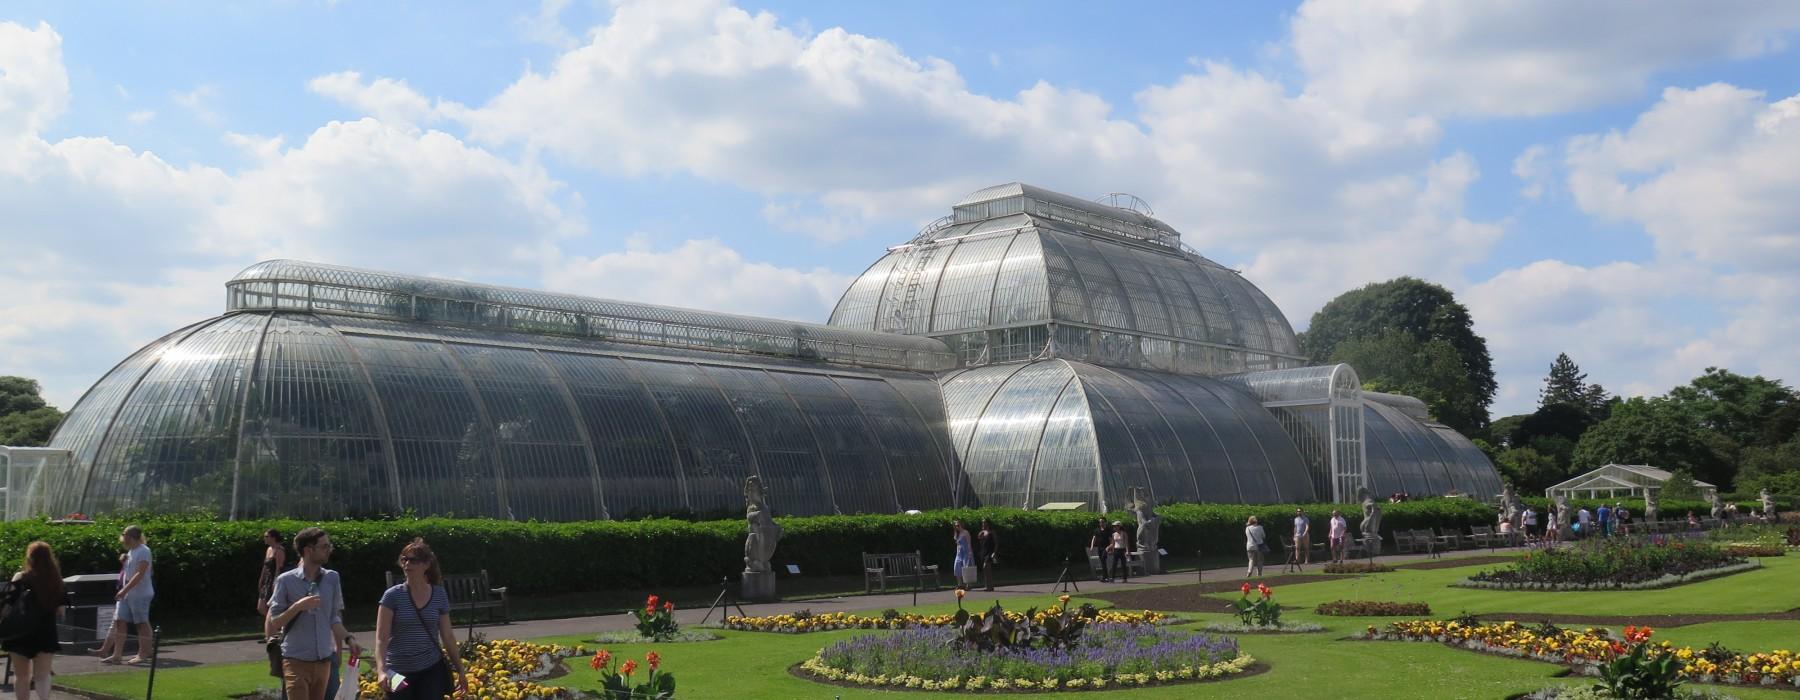 Adventures at Kew Gardens